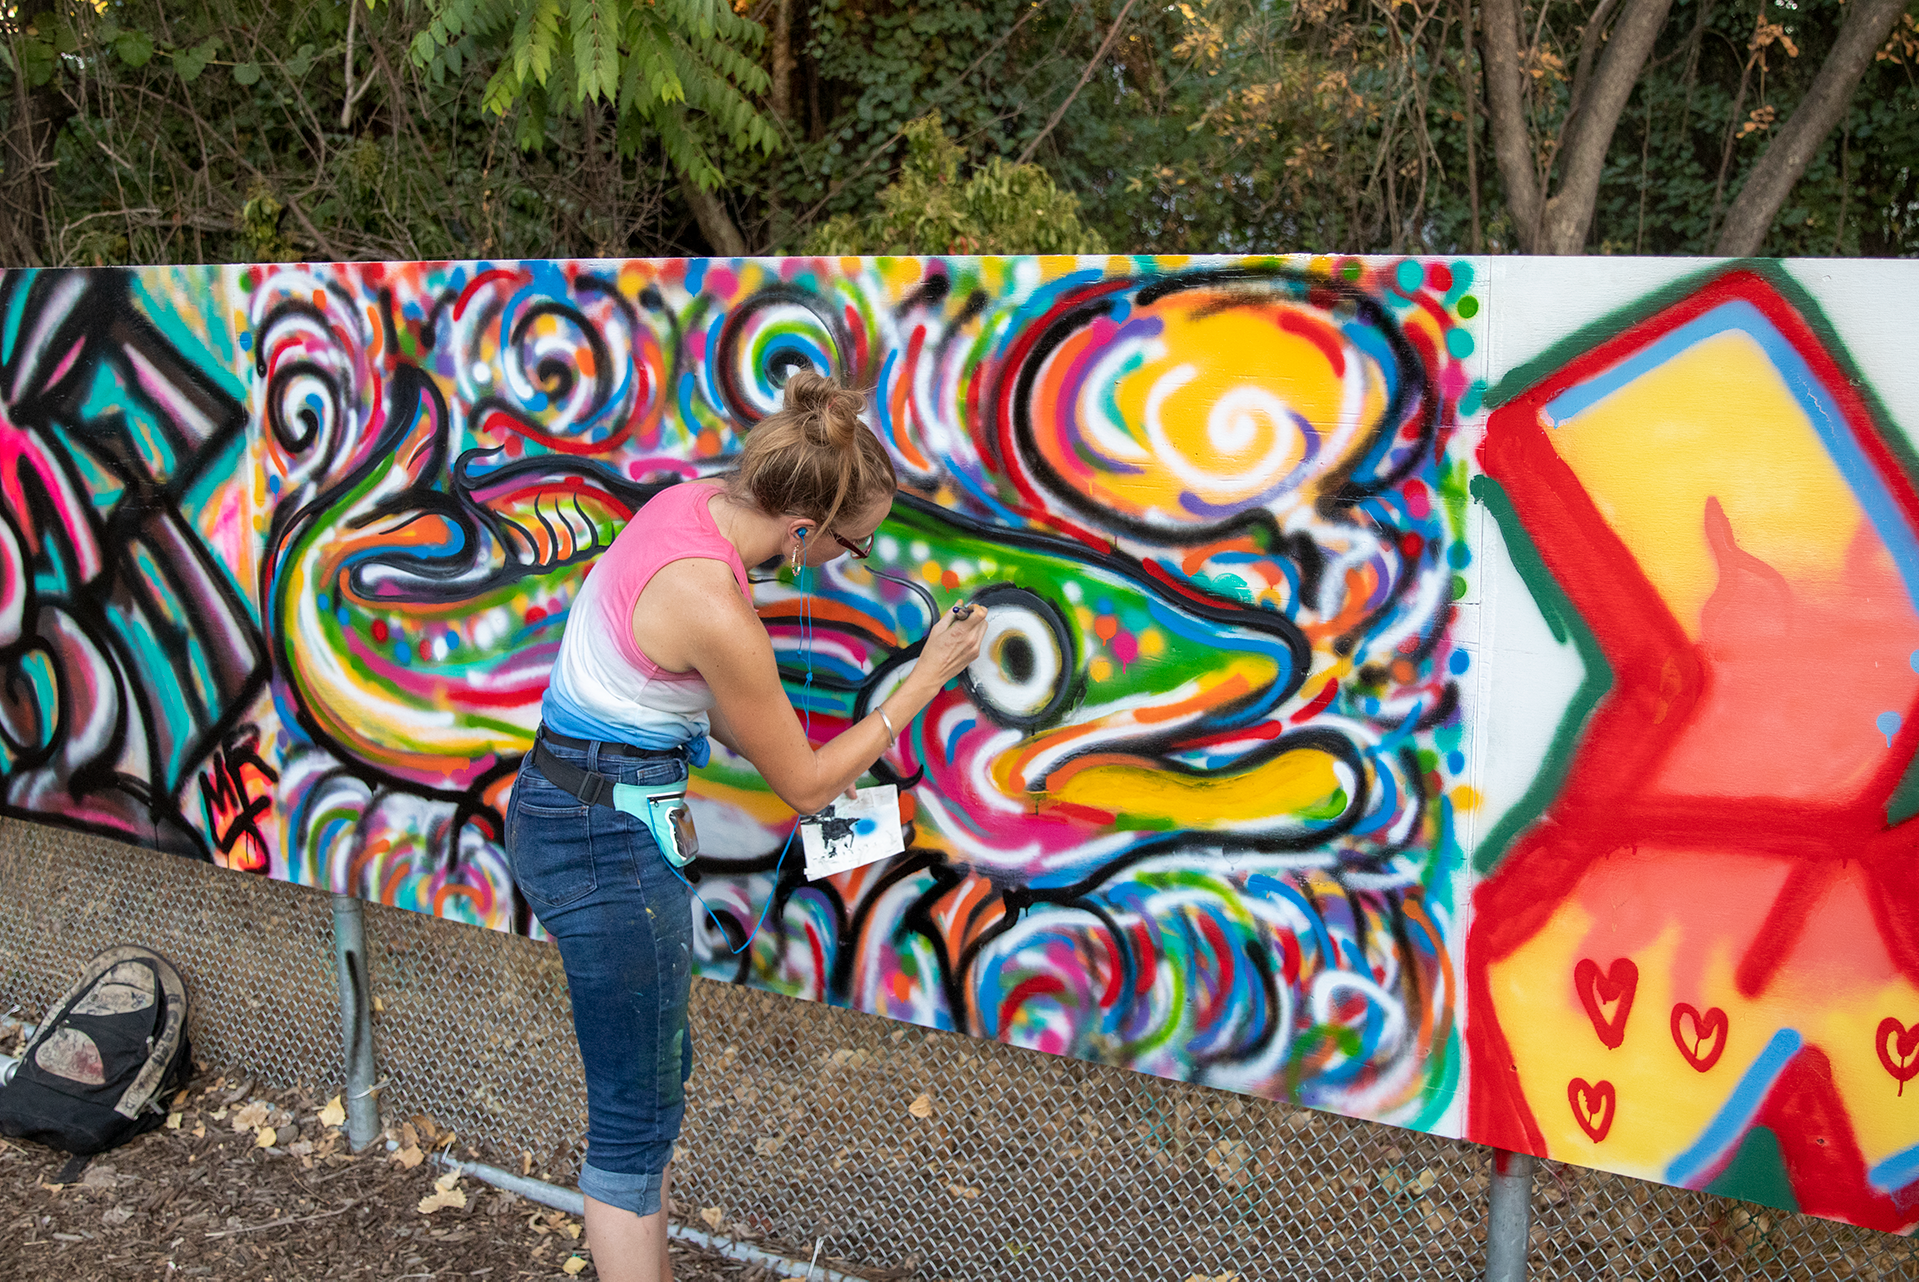 May contain: person, human, art, mural, painting, and graffiti